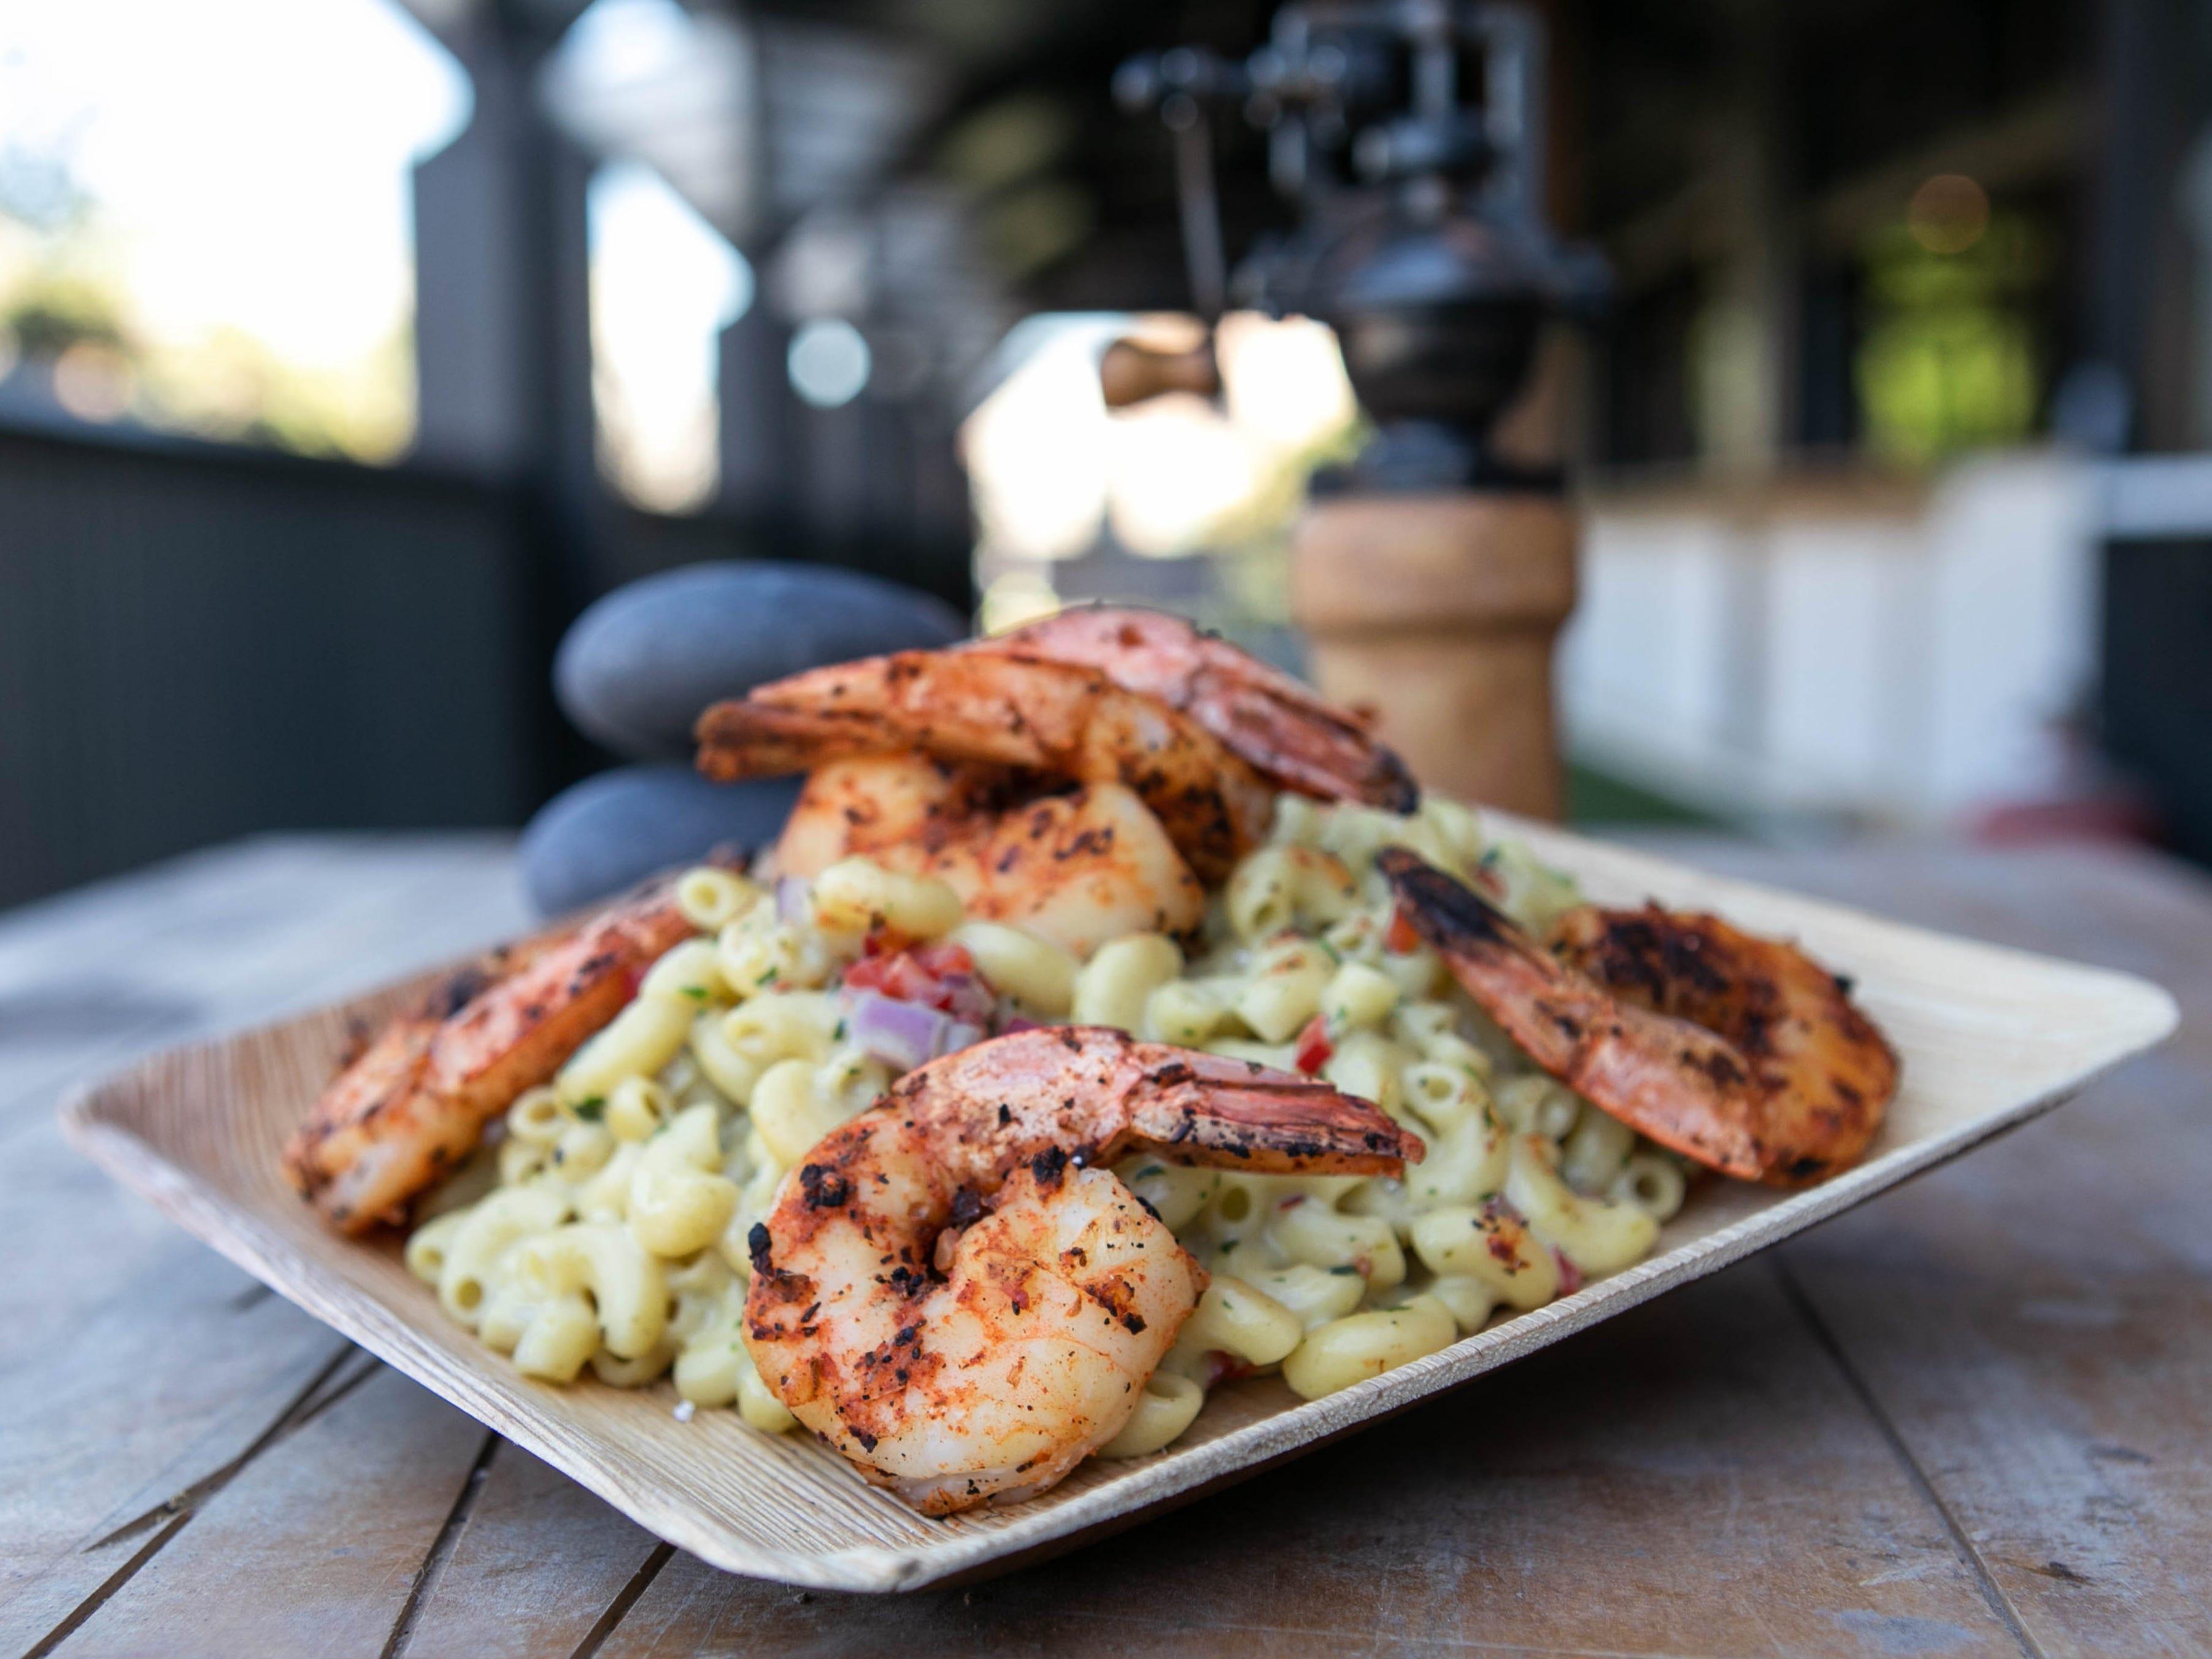 Blackened shrimp green chile macaroni at Varsity Tavern on Mill Avenue.